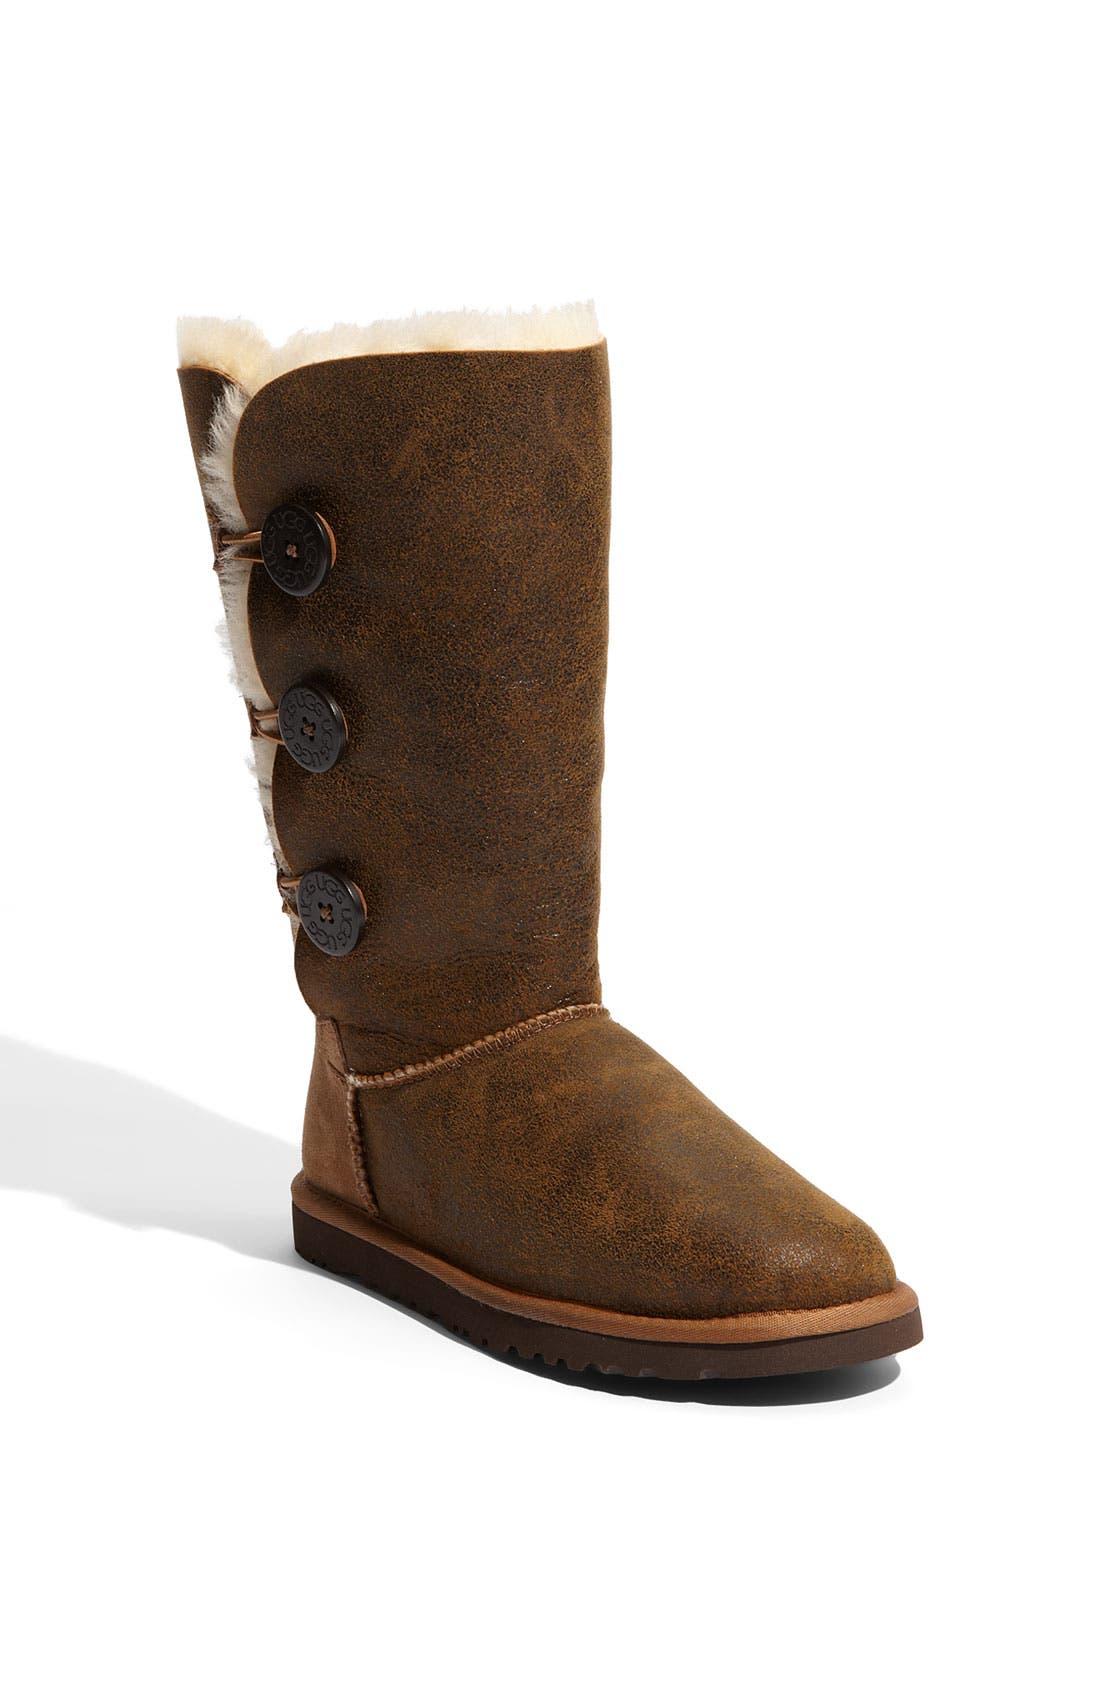 Alternate Image 1 Selected - UGG® Australia 'Bailey Button Triplet' Boot (Bomber) (Women)